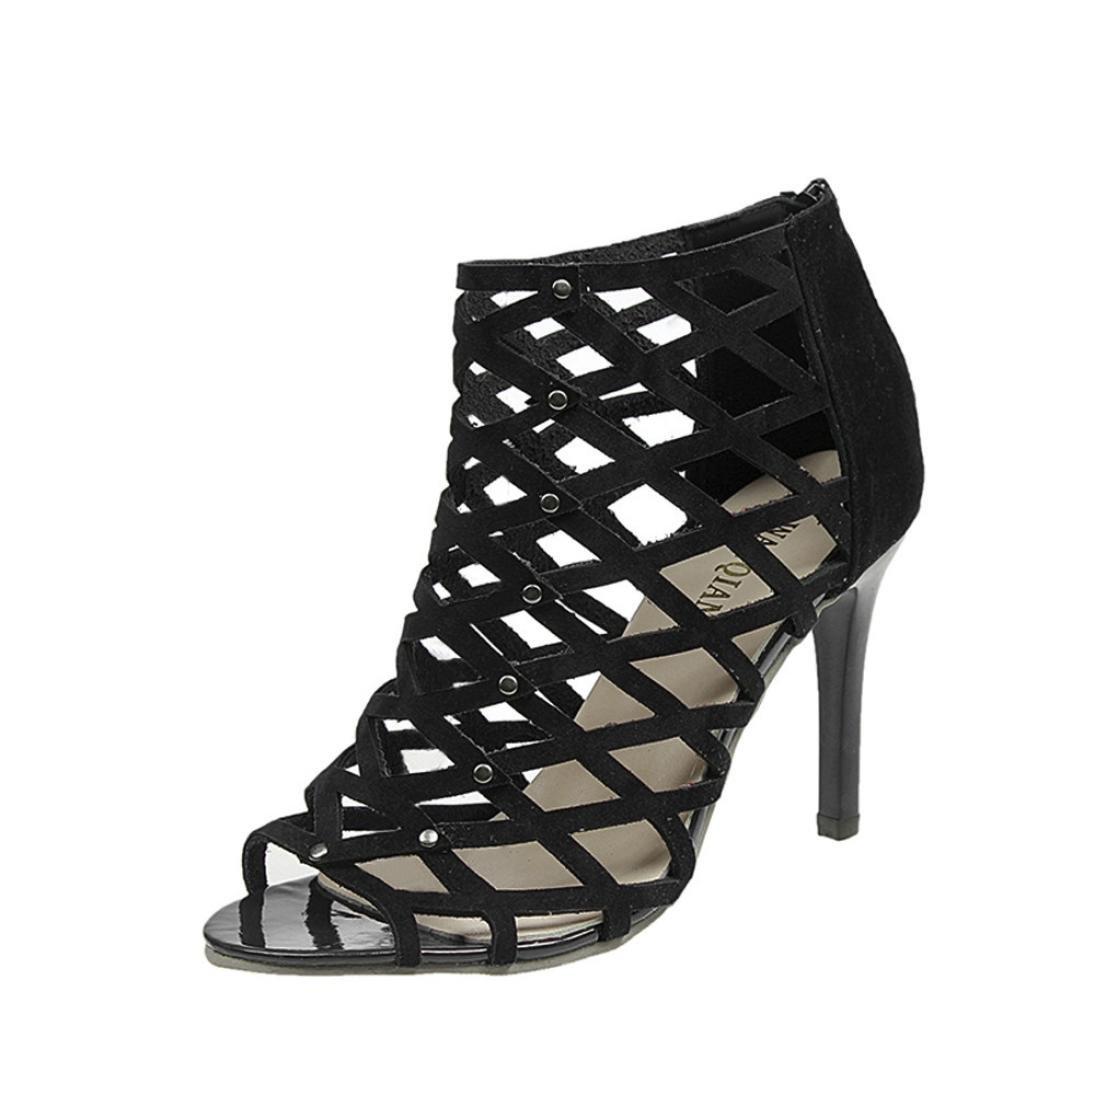 a66f8e5344c7ed Amazon.com  WuyiMC® Women shoes Women s Peep Toe High Heels Shoes Rivet  Roman Gladiator Sandals Summer Dress Shoes  Sports   Outdoors